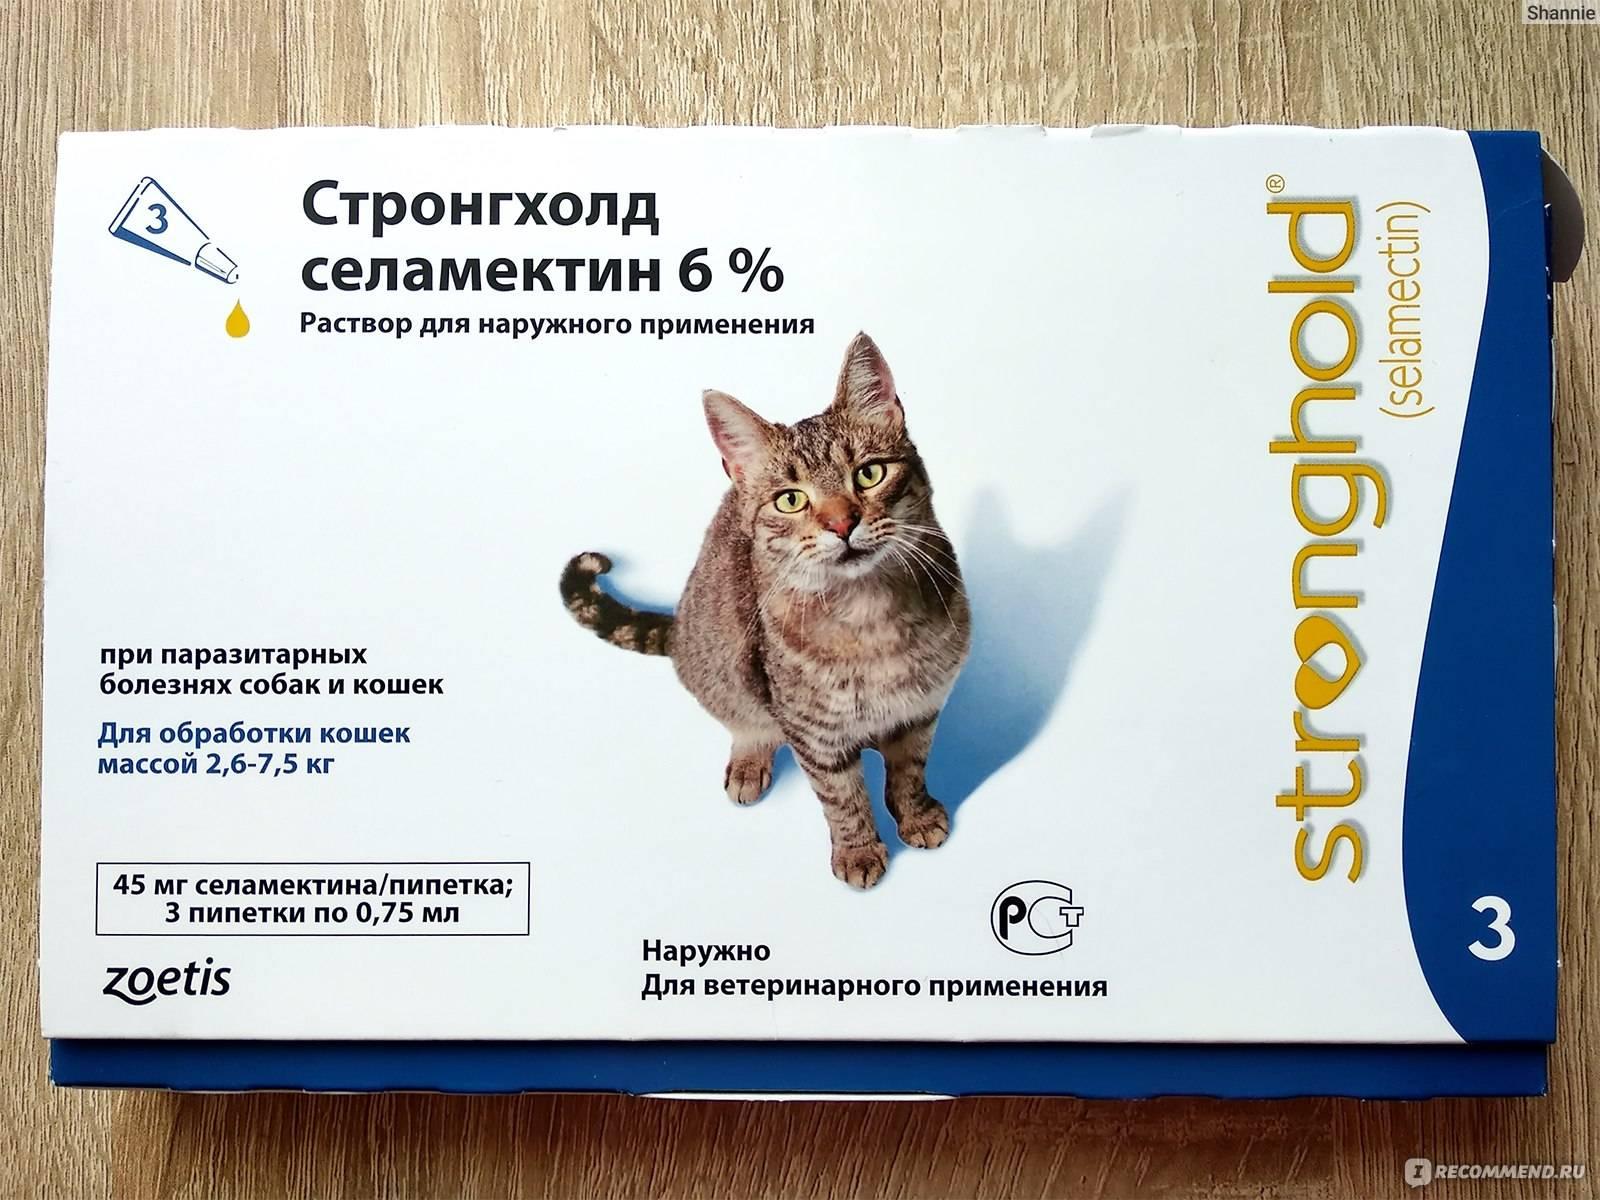 Стронгхолд для кошек – обзор препарата